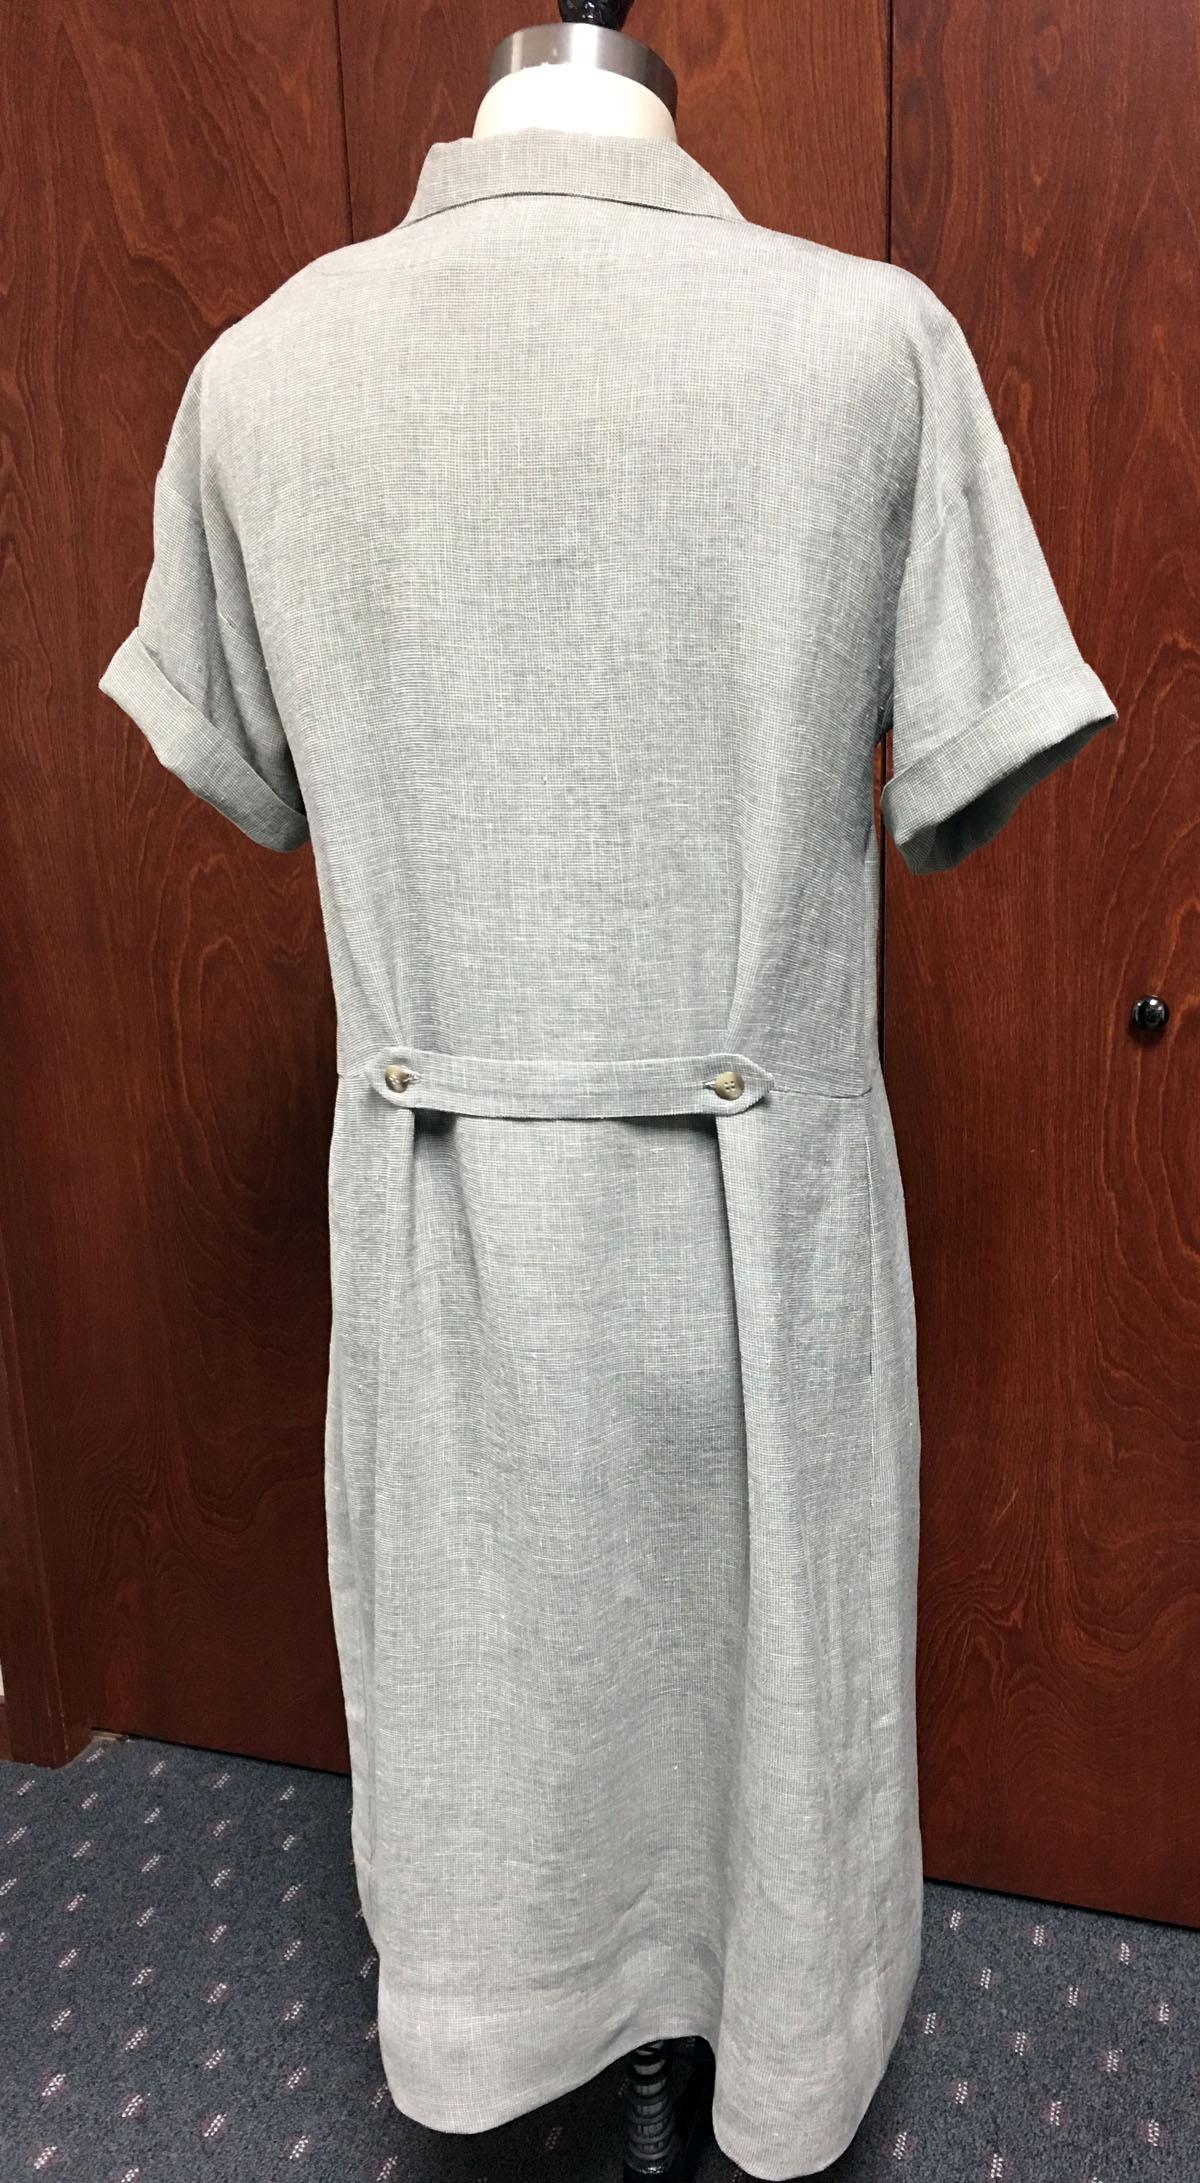 Favorite unworn linen dress, back